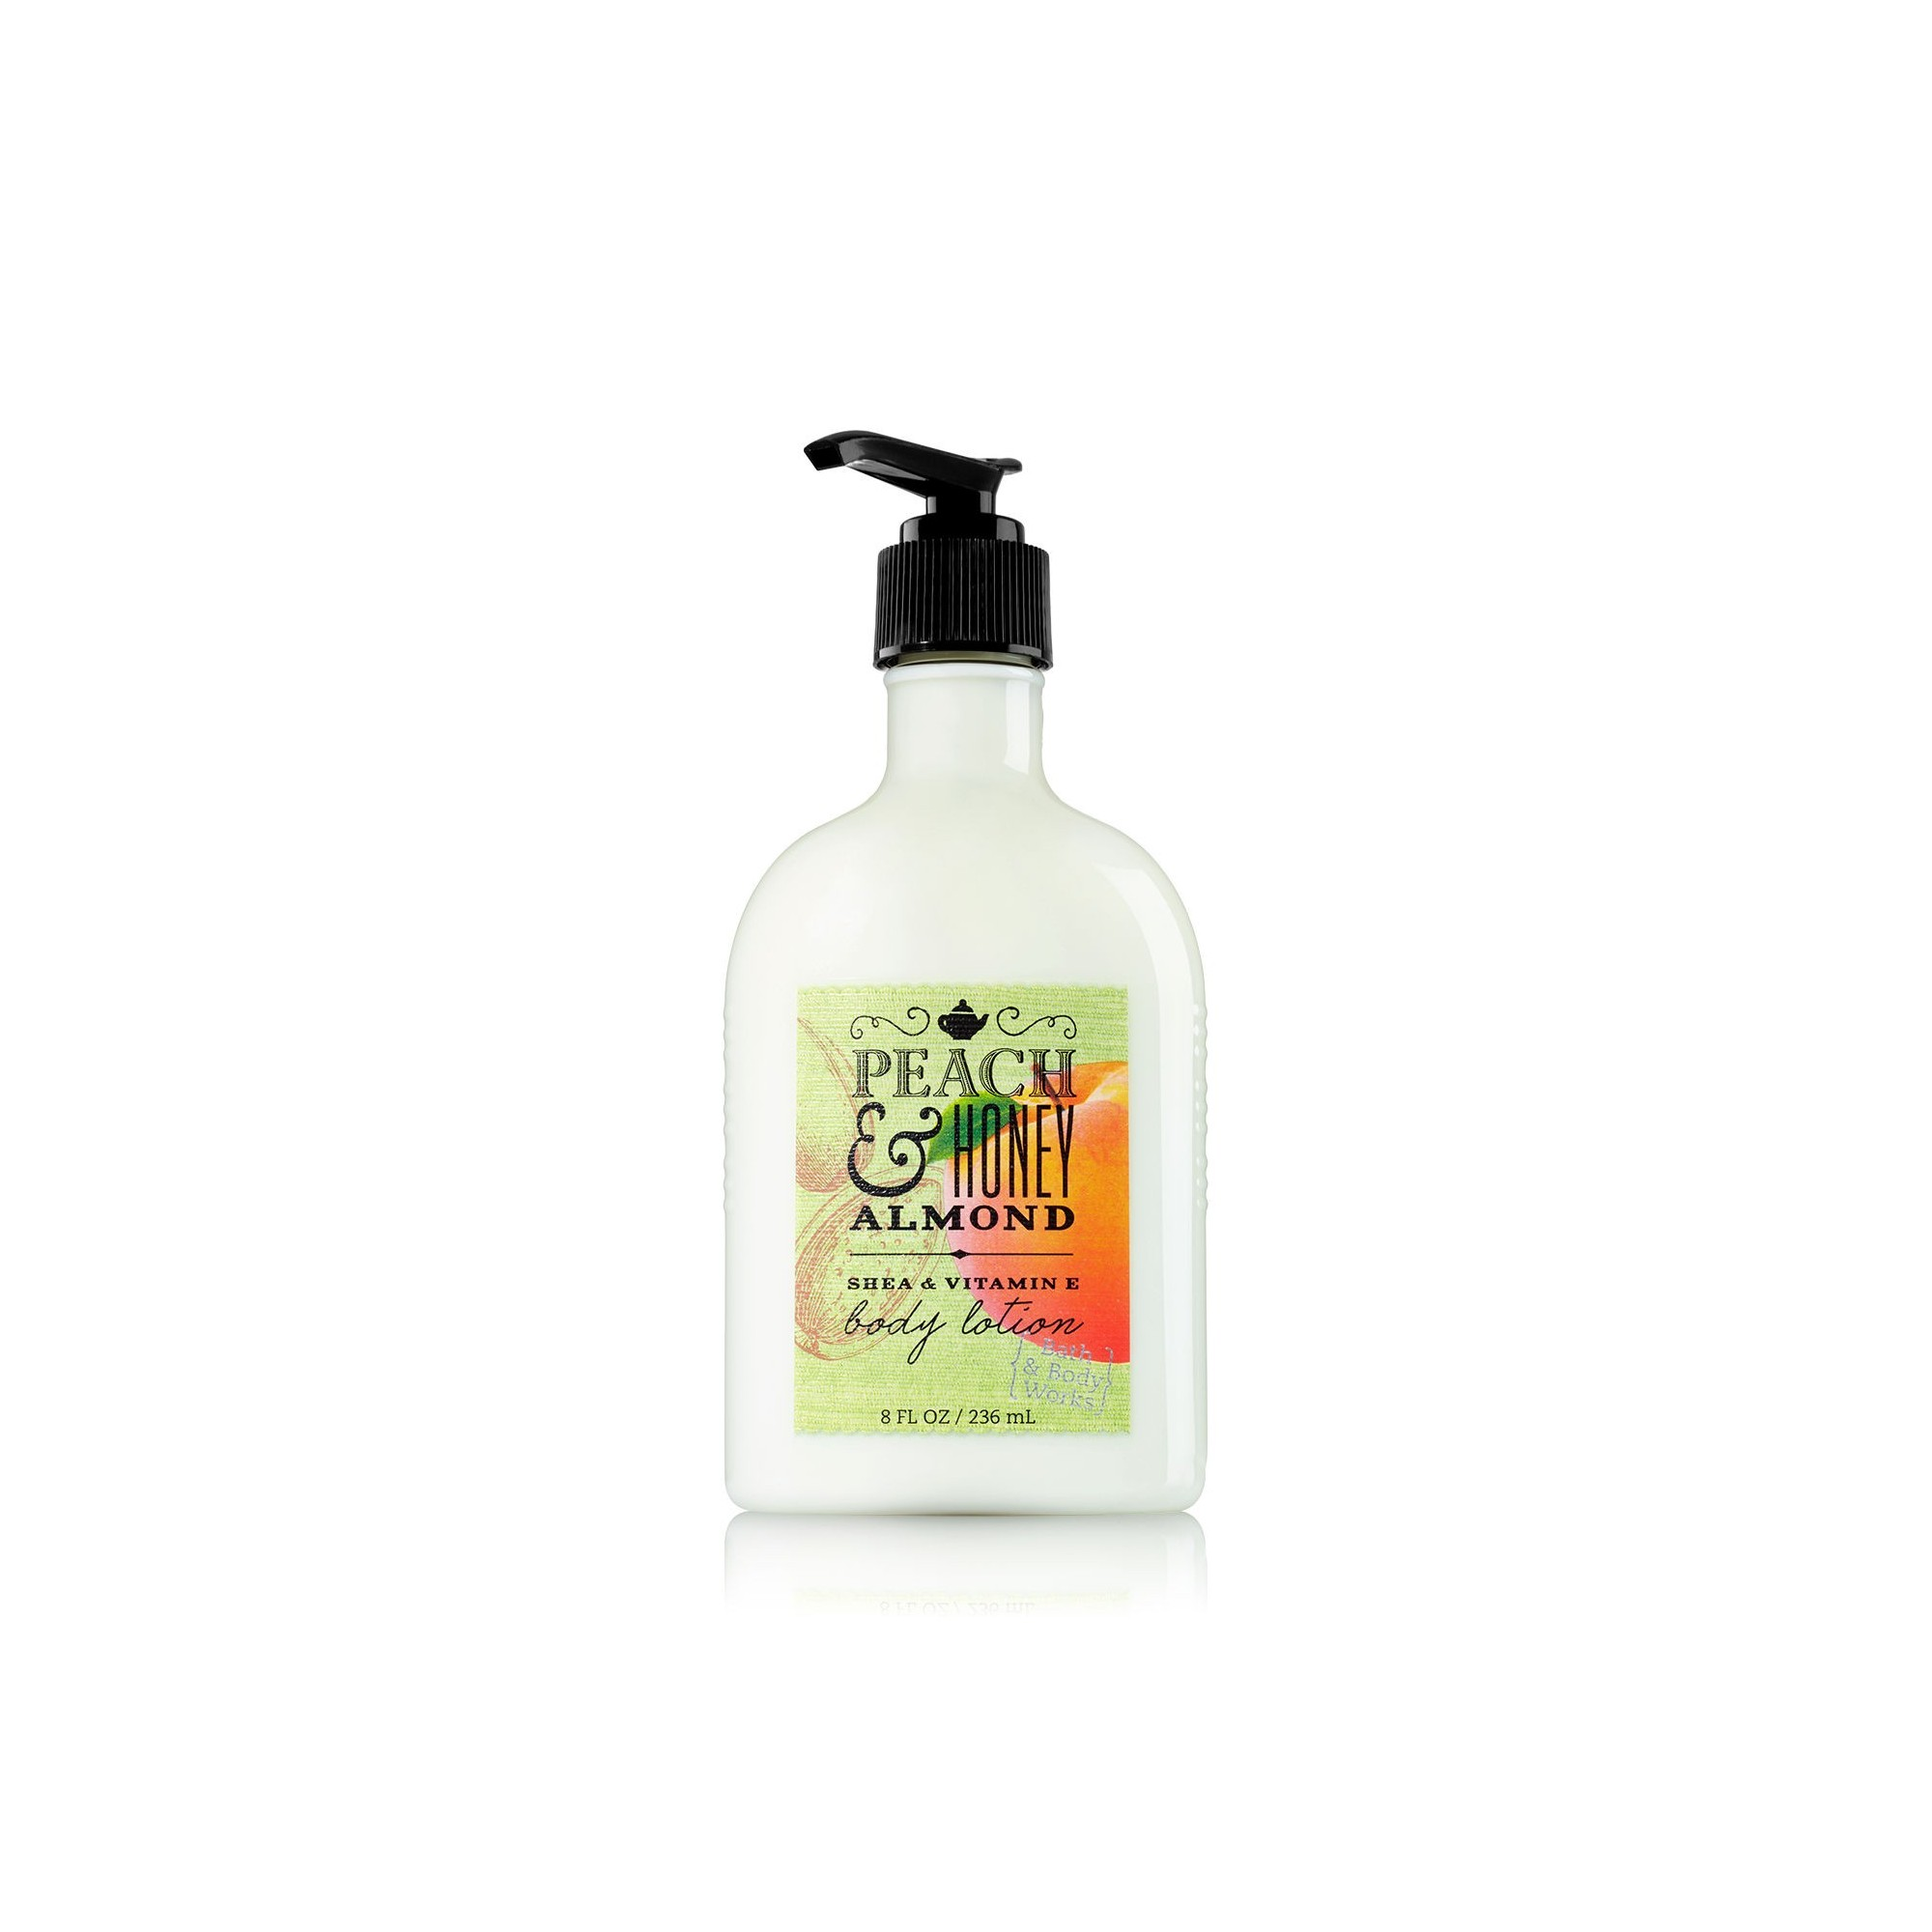 Bath & Body Works Peach & Honey Almond Body Lotion